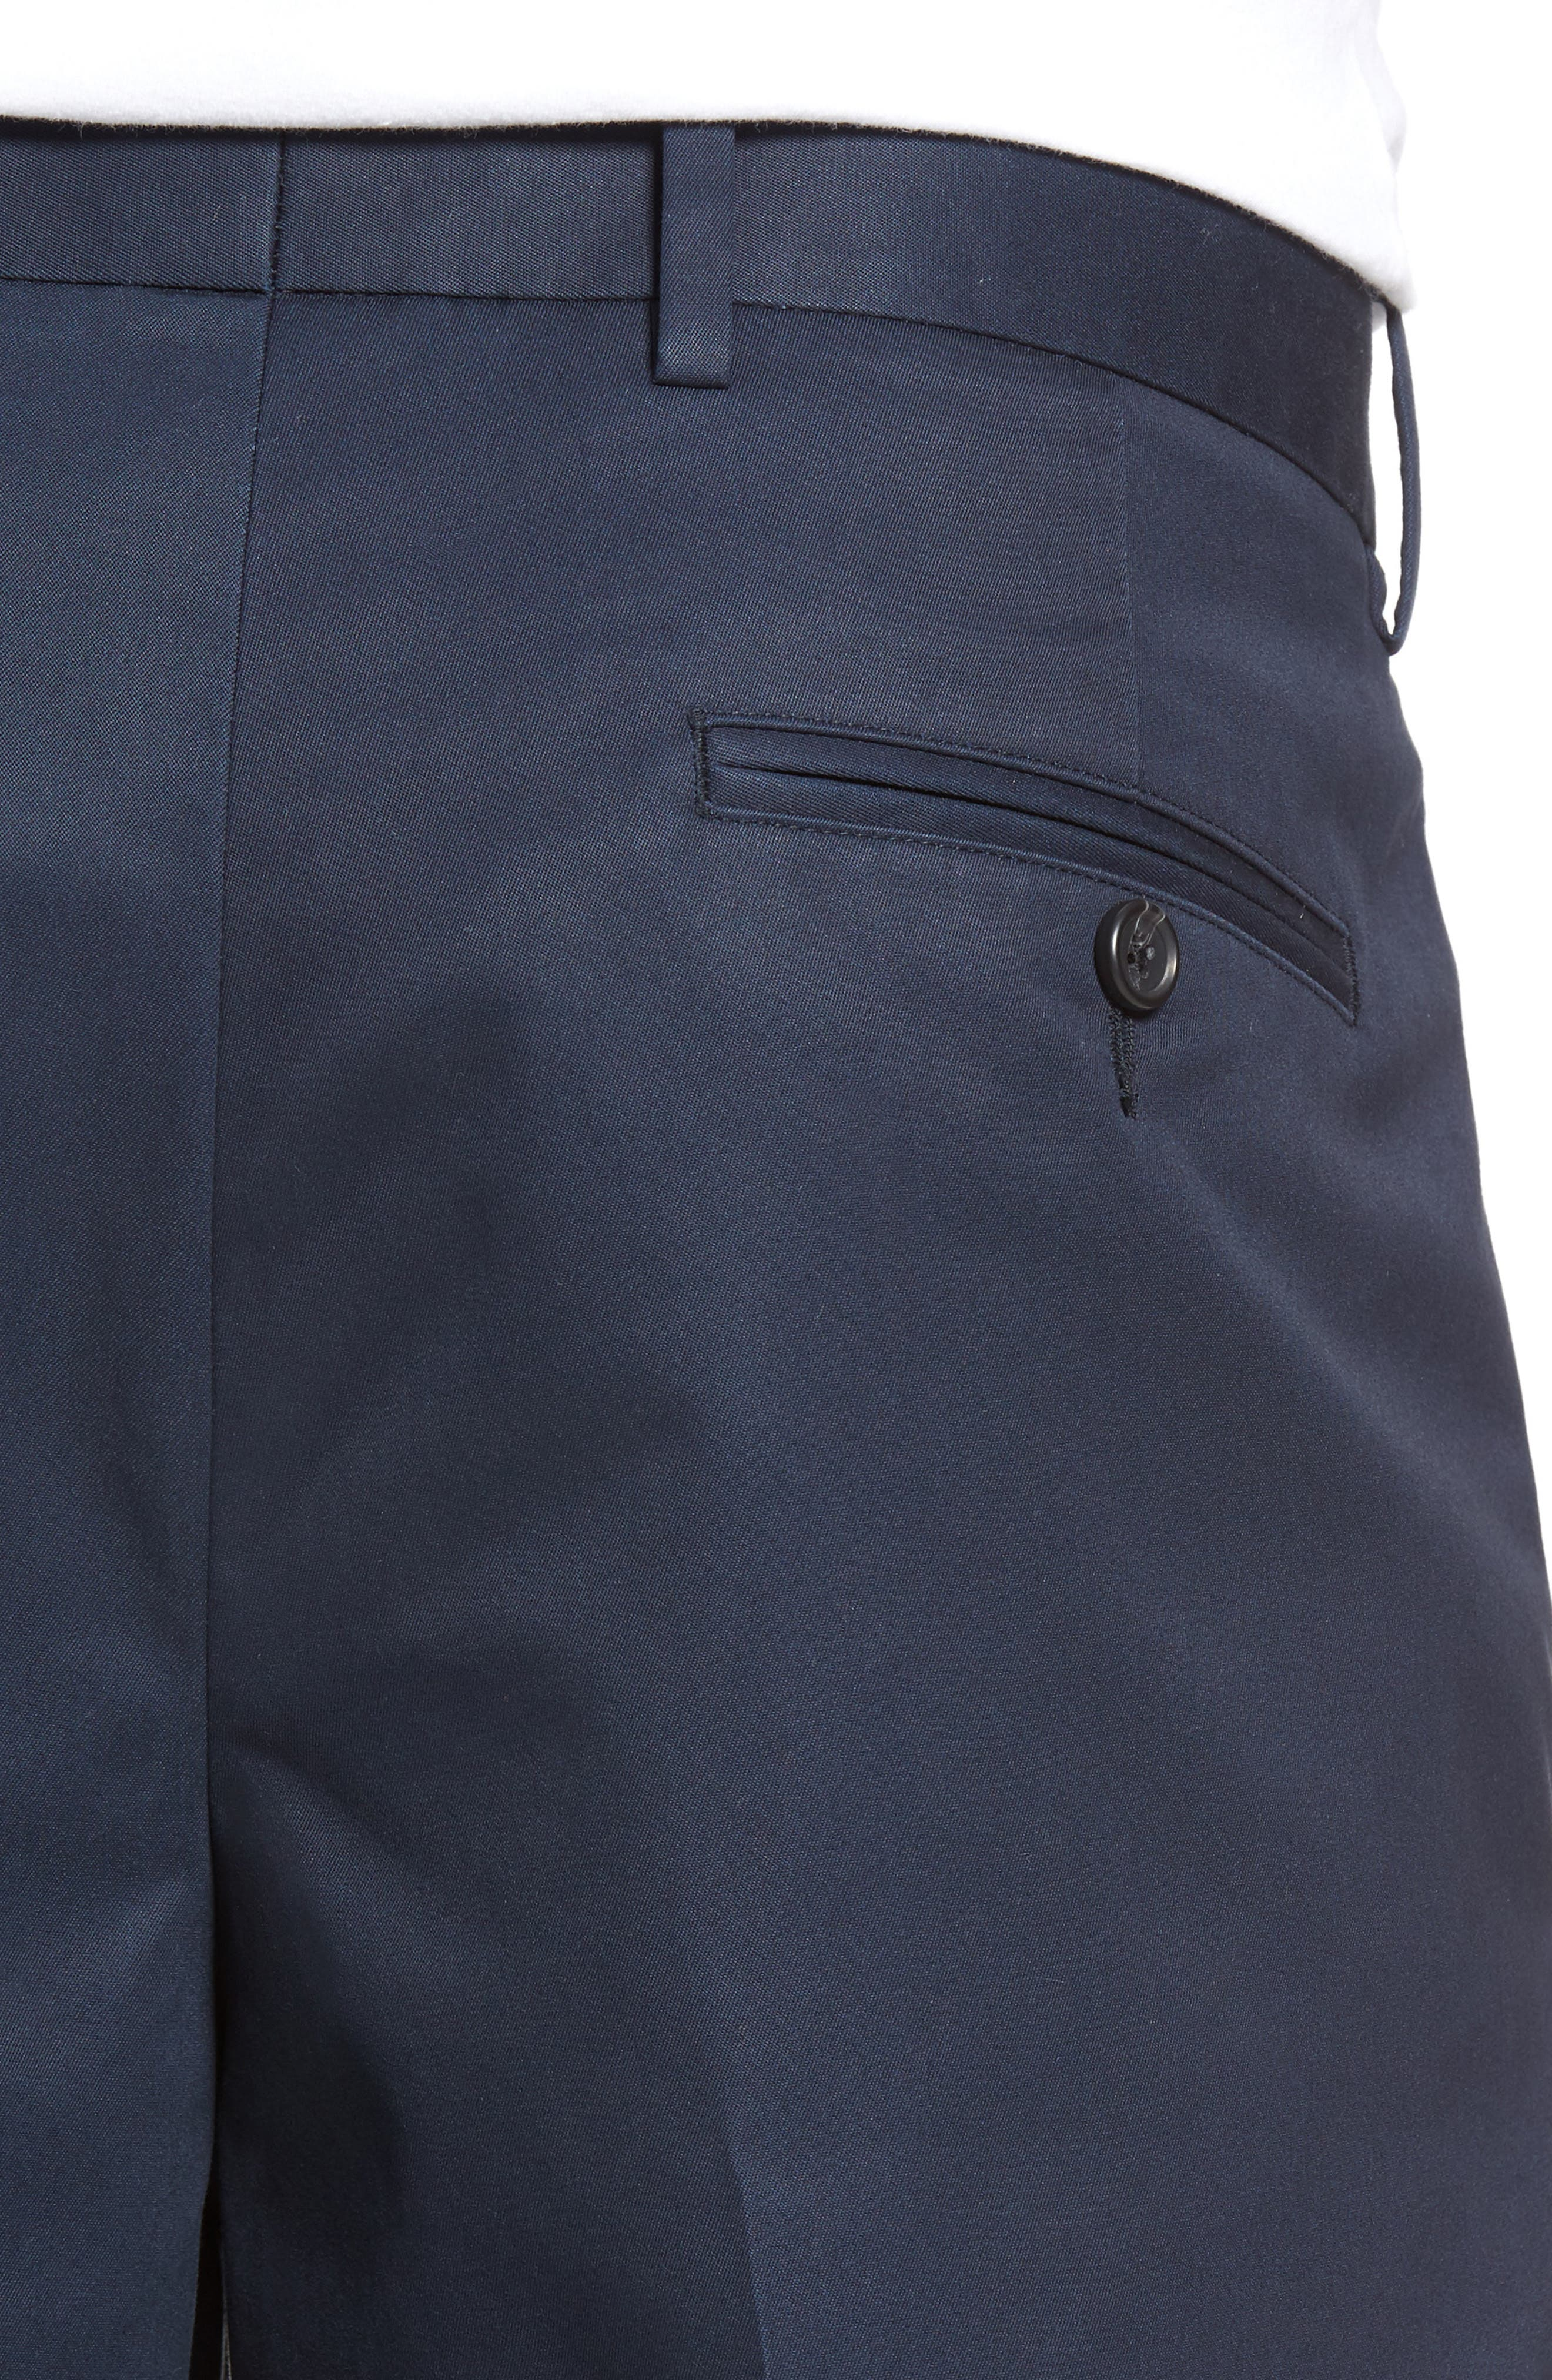 Pleated Supima<sup>®</sup> Cotton Shorts,                             Alternate thumbnail 20, color,